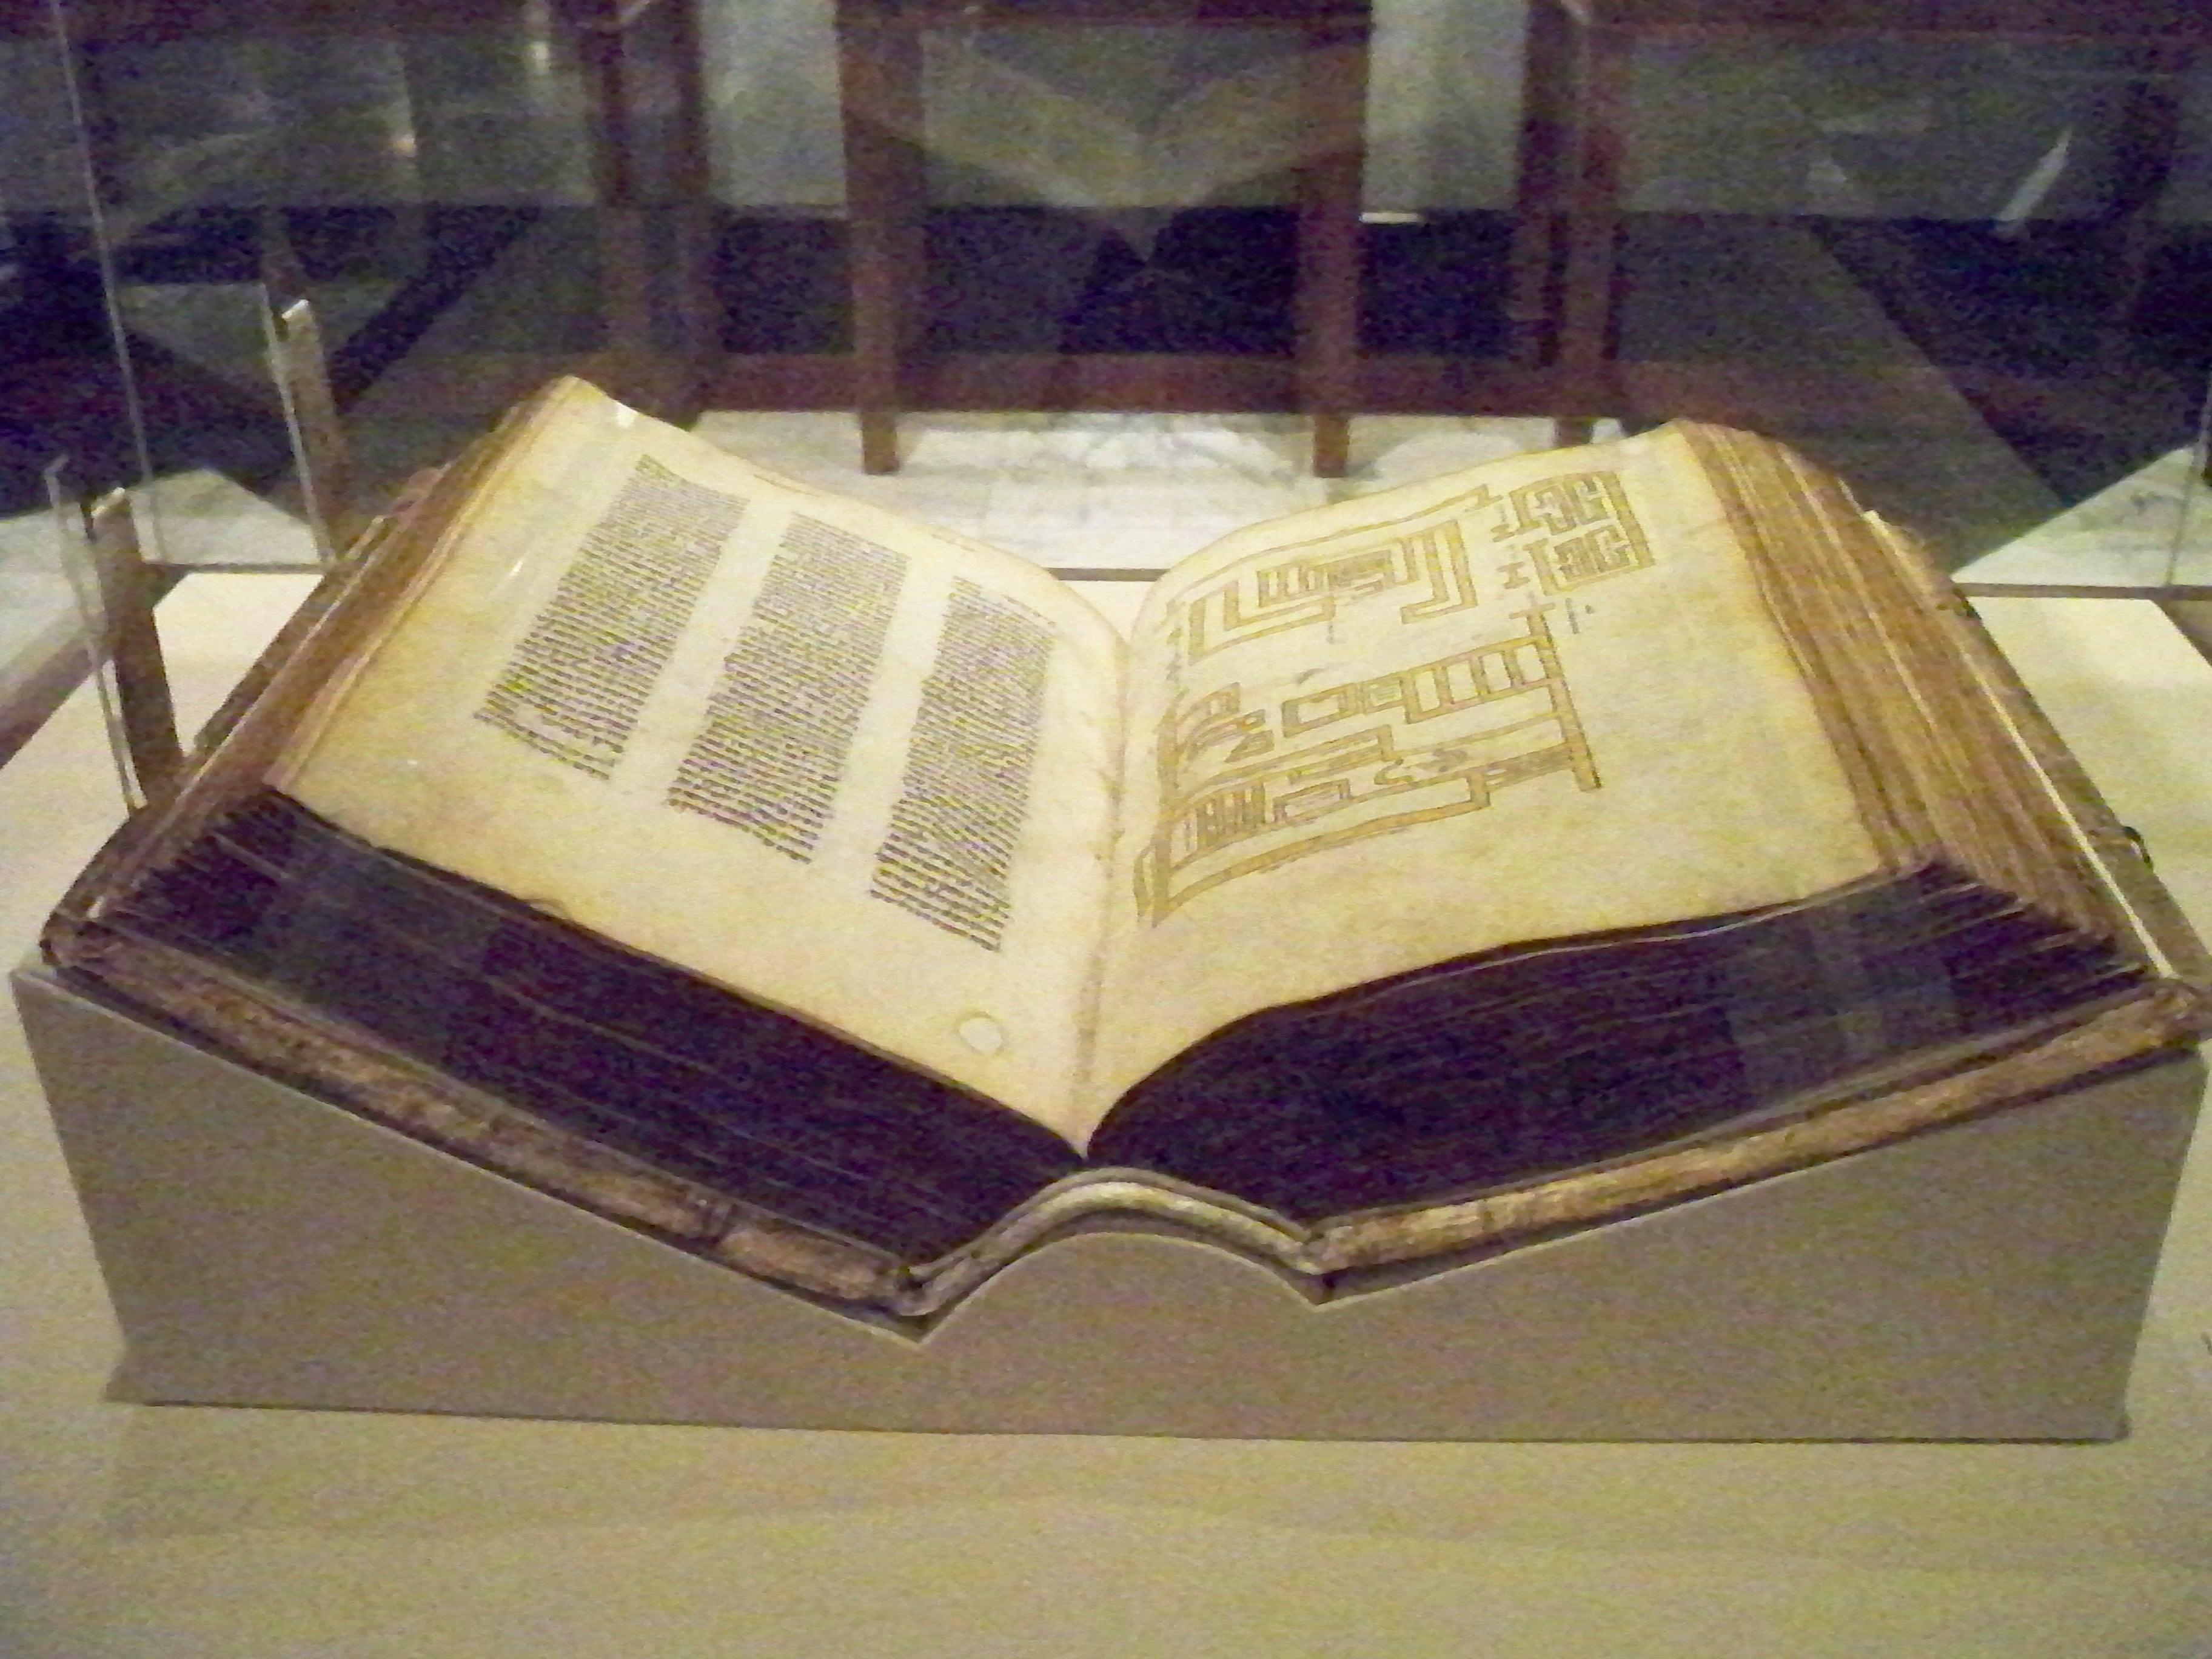 Sephardic law and customs - Wikipedia